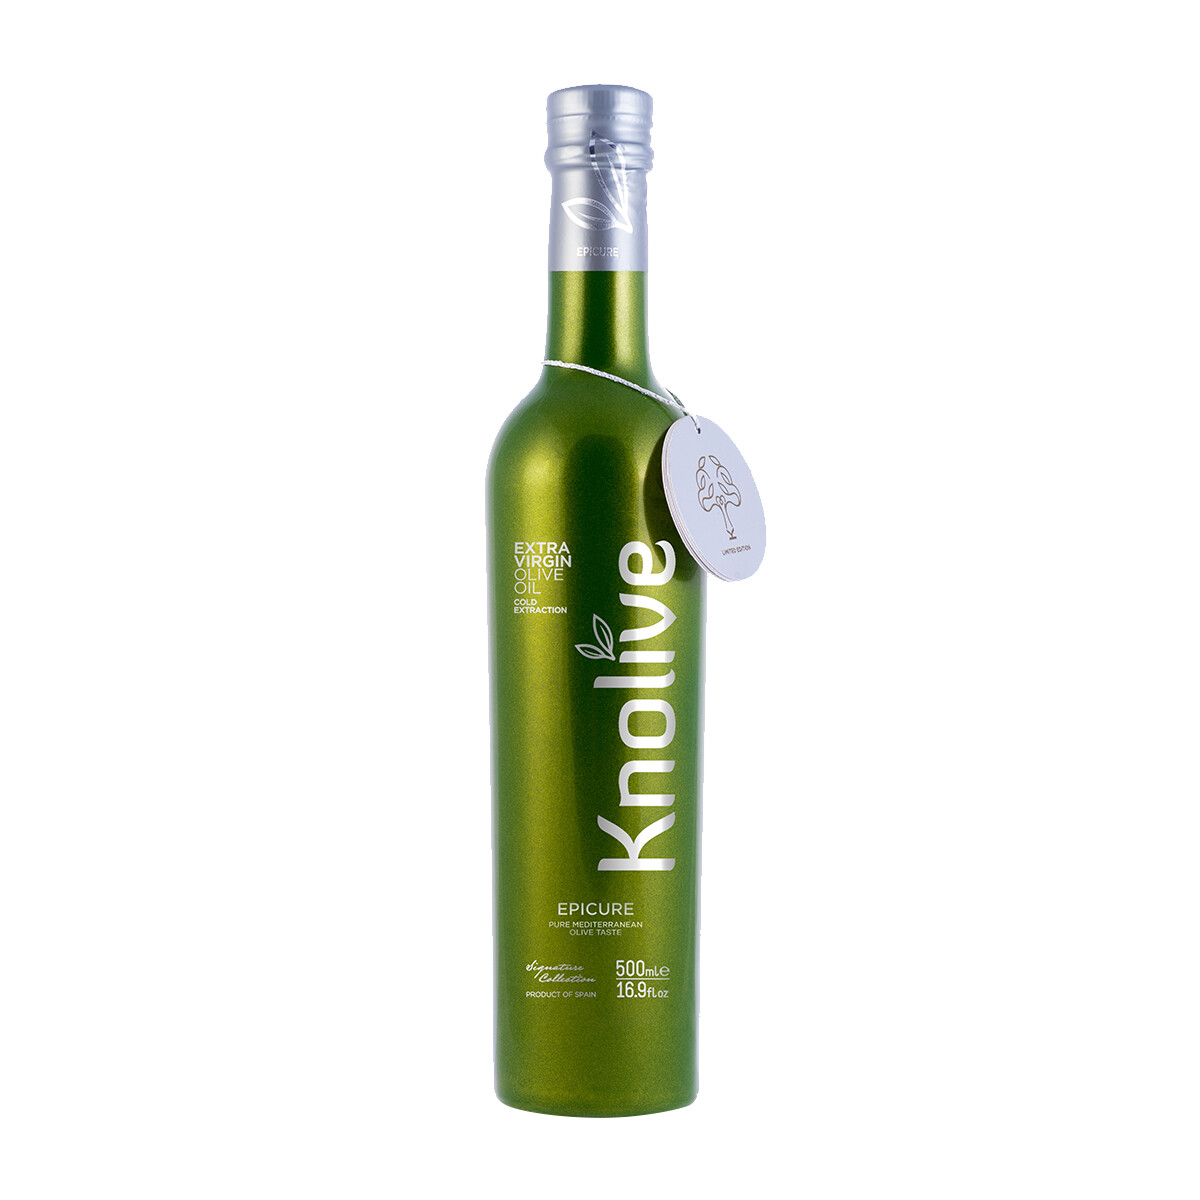 Knolive Epicure 500ml